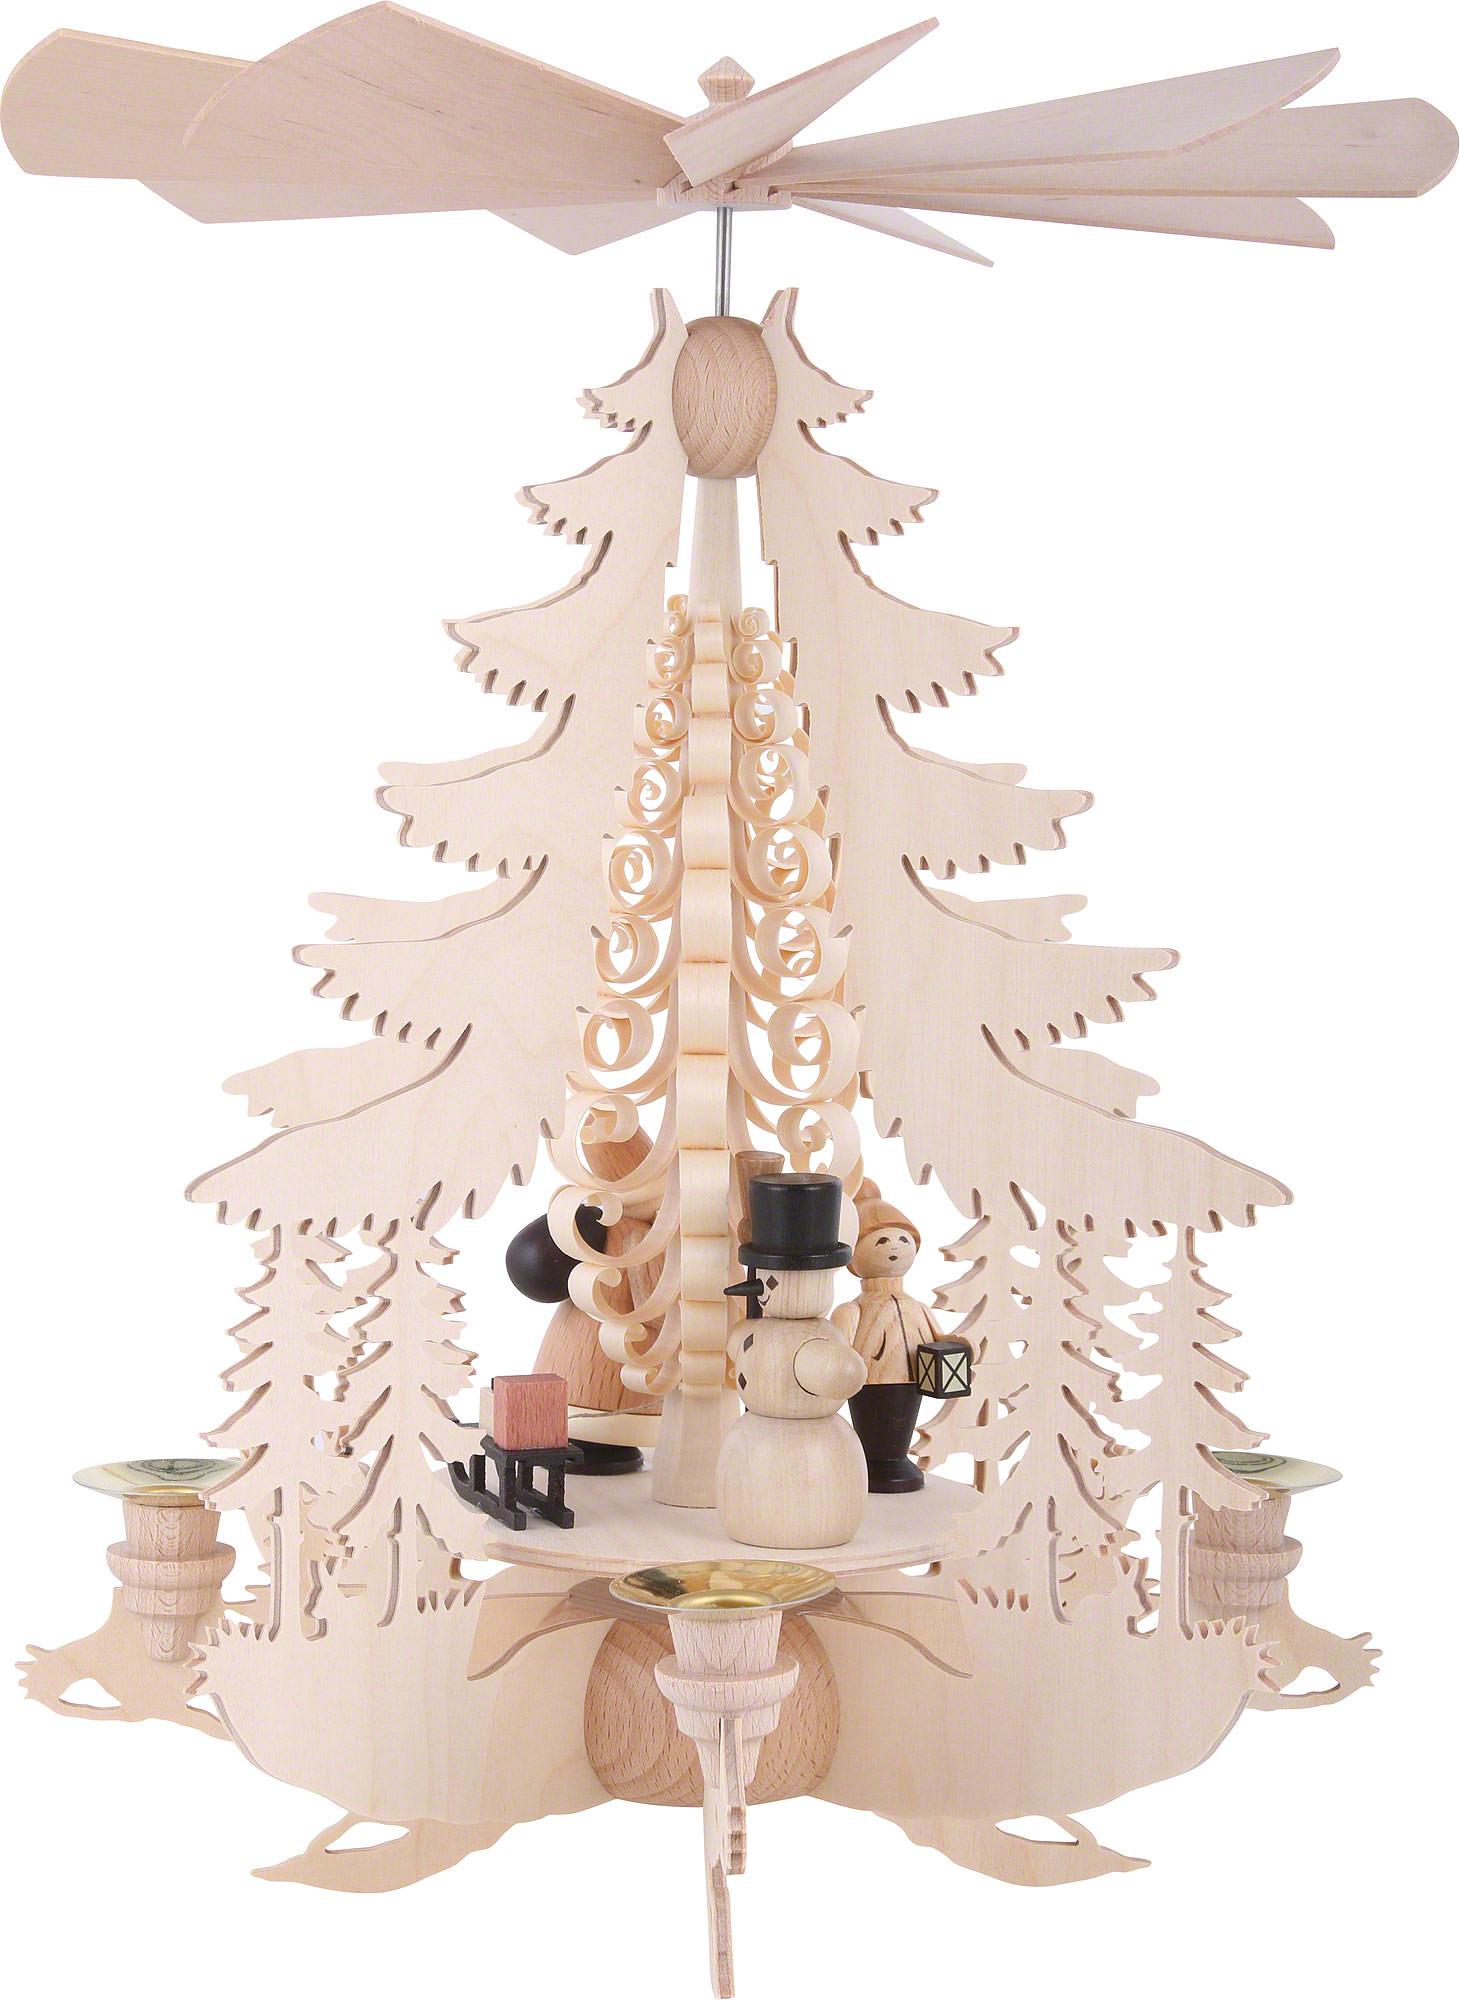 Pyramid christmas ornament - 1 Tier Pyramid Christmas Figures 35cm 14inch